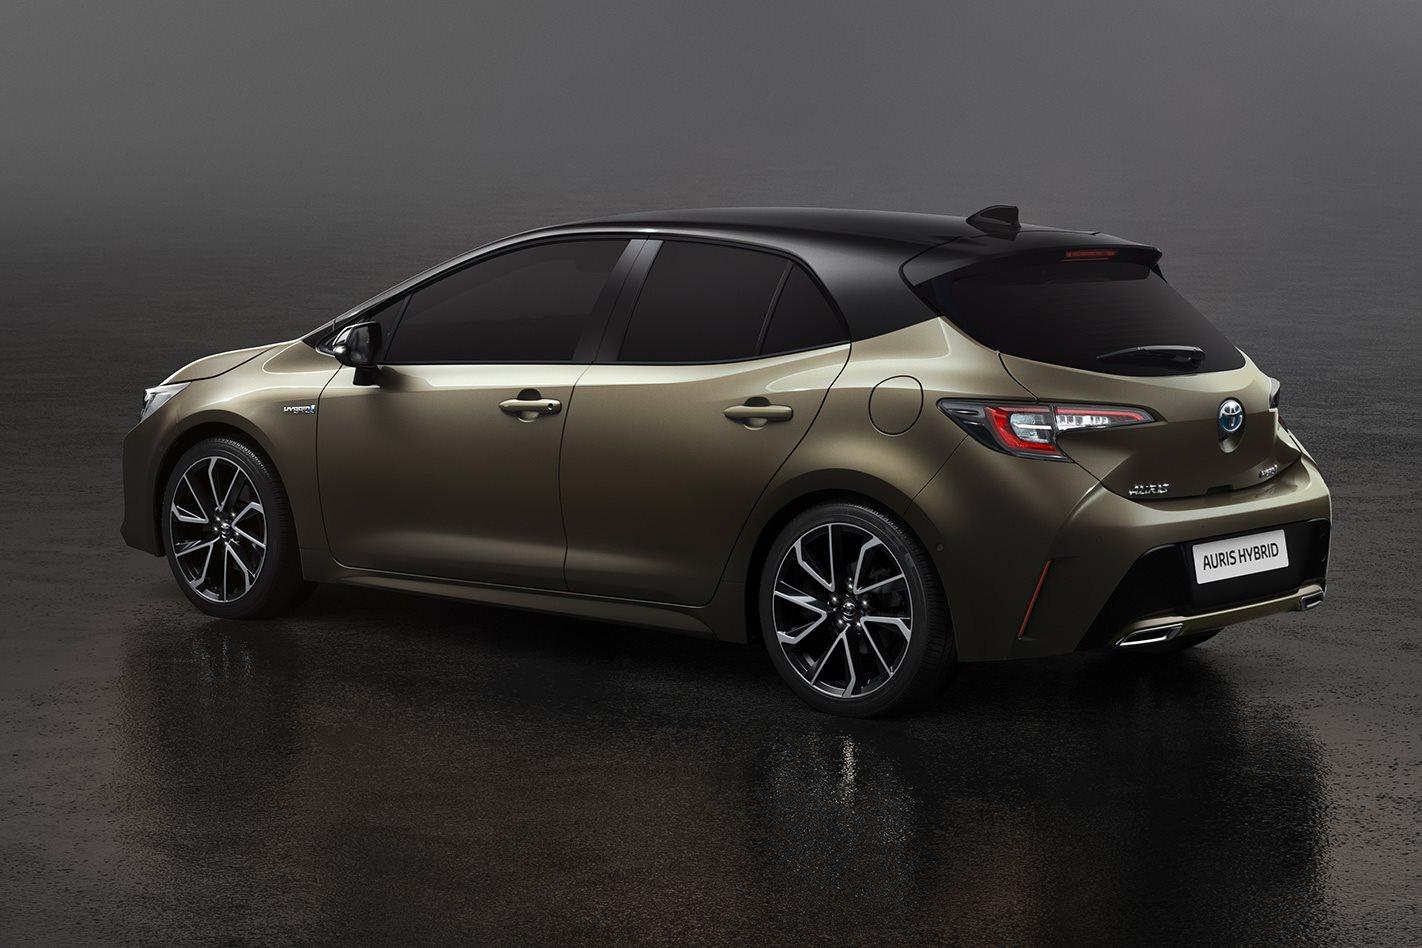 Toyota Auris Next Generation 2018 >> 2018 Geneva Motor Show: New Toyota Corolla revealed